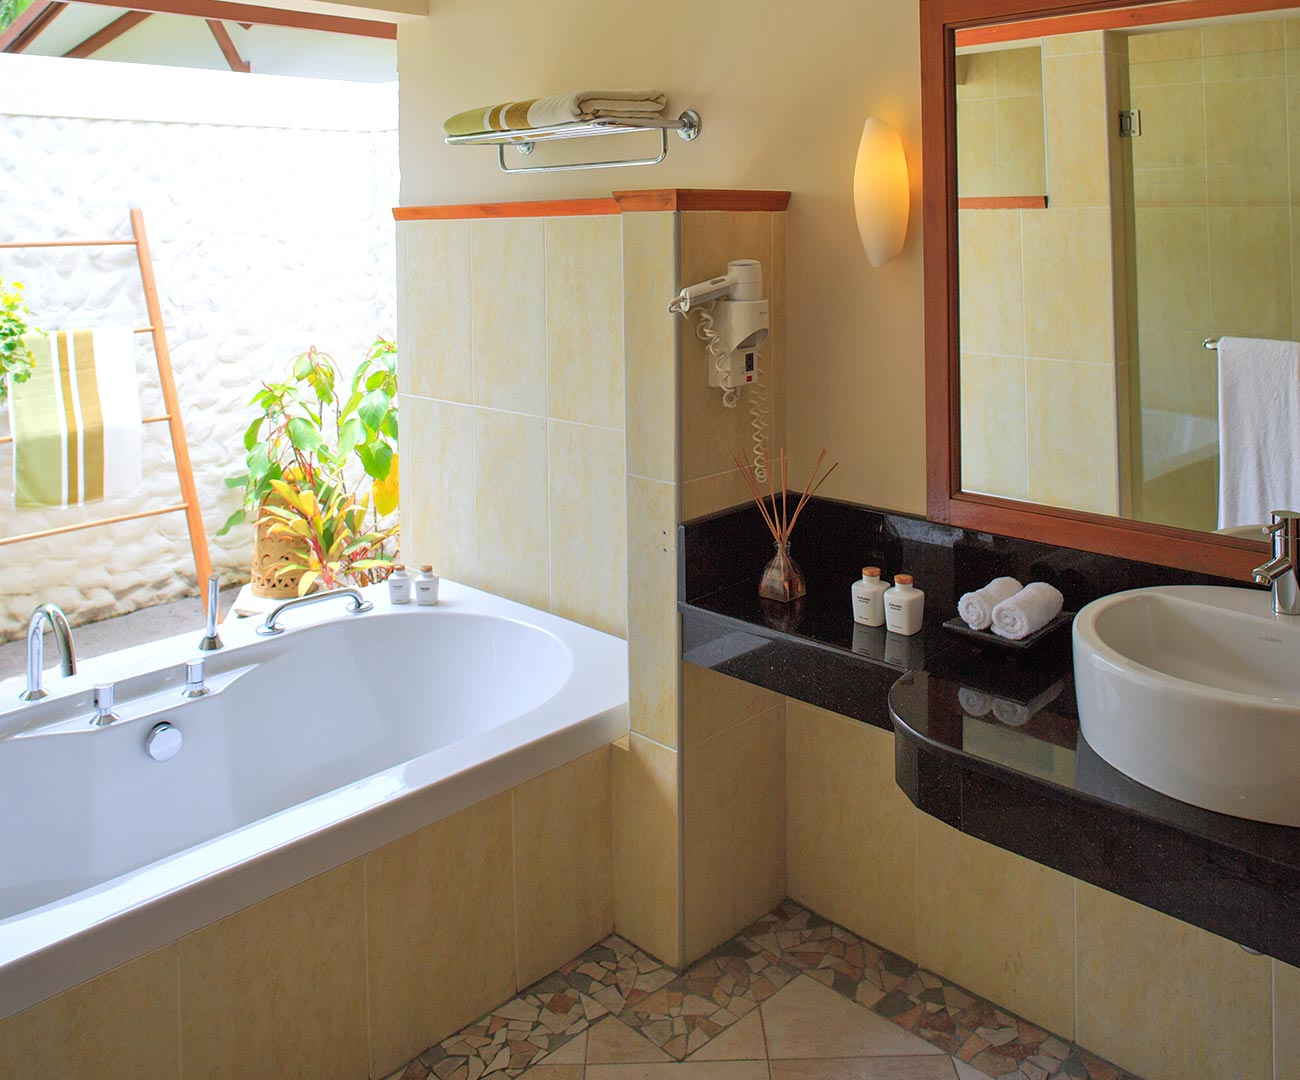 Kurumba Maldives - Deluxe Room Bathroom Image  - Maldives Resort